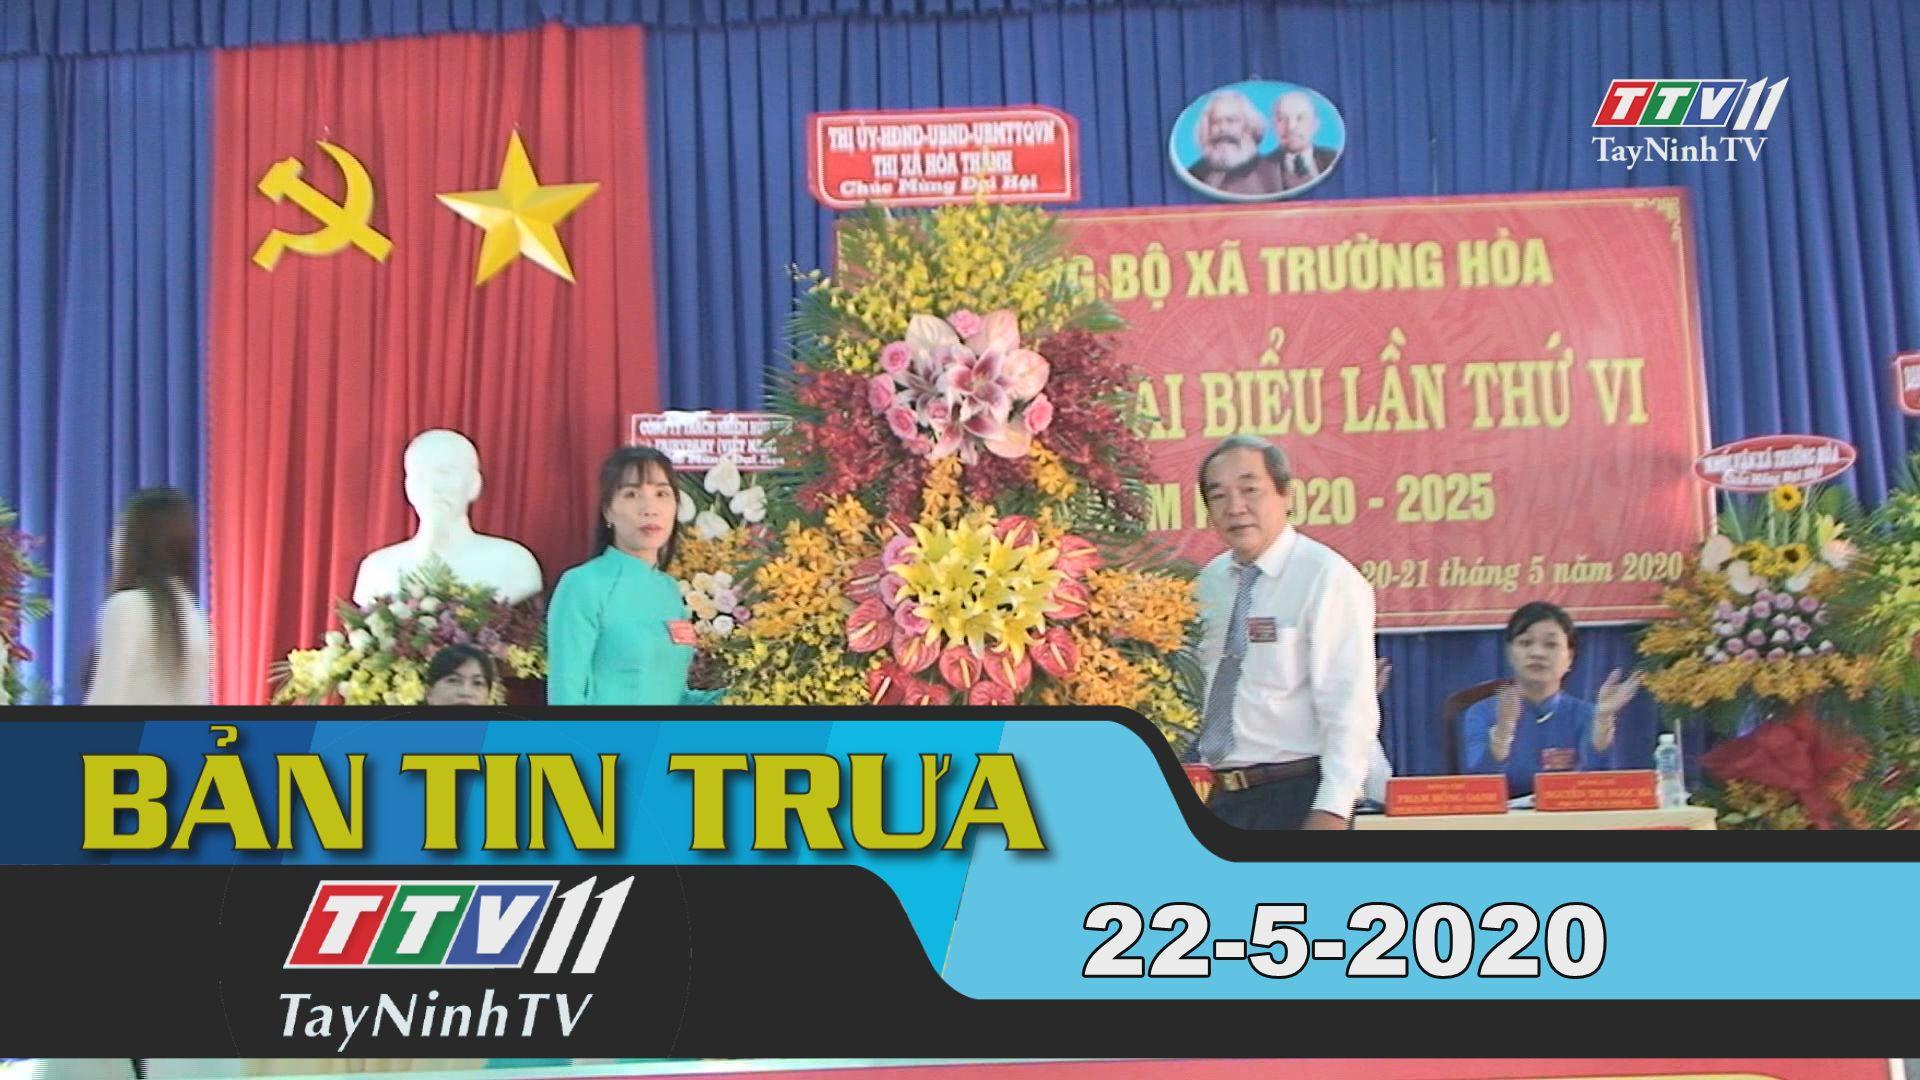 Bản tin trưa 22-5-2020 | Tin tức hôm nay | TayNinhTV